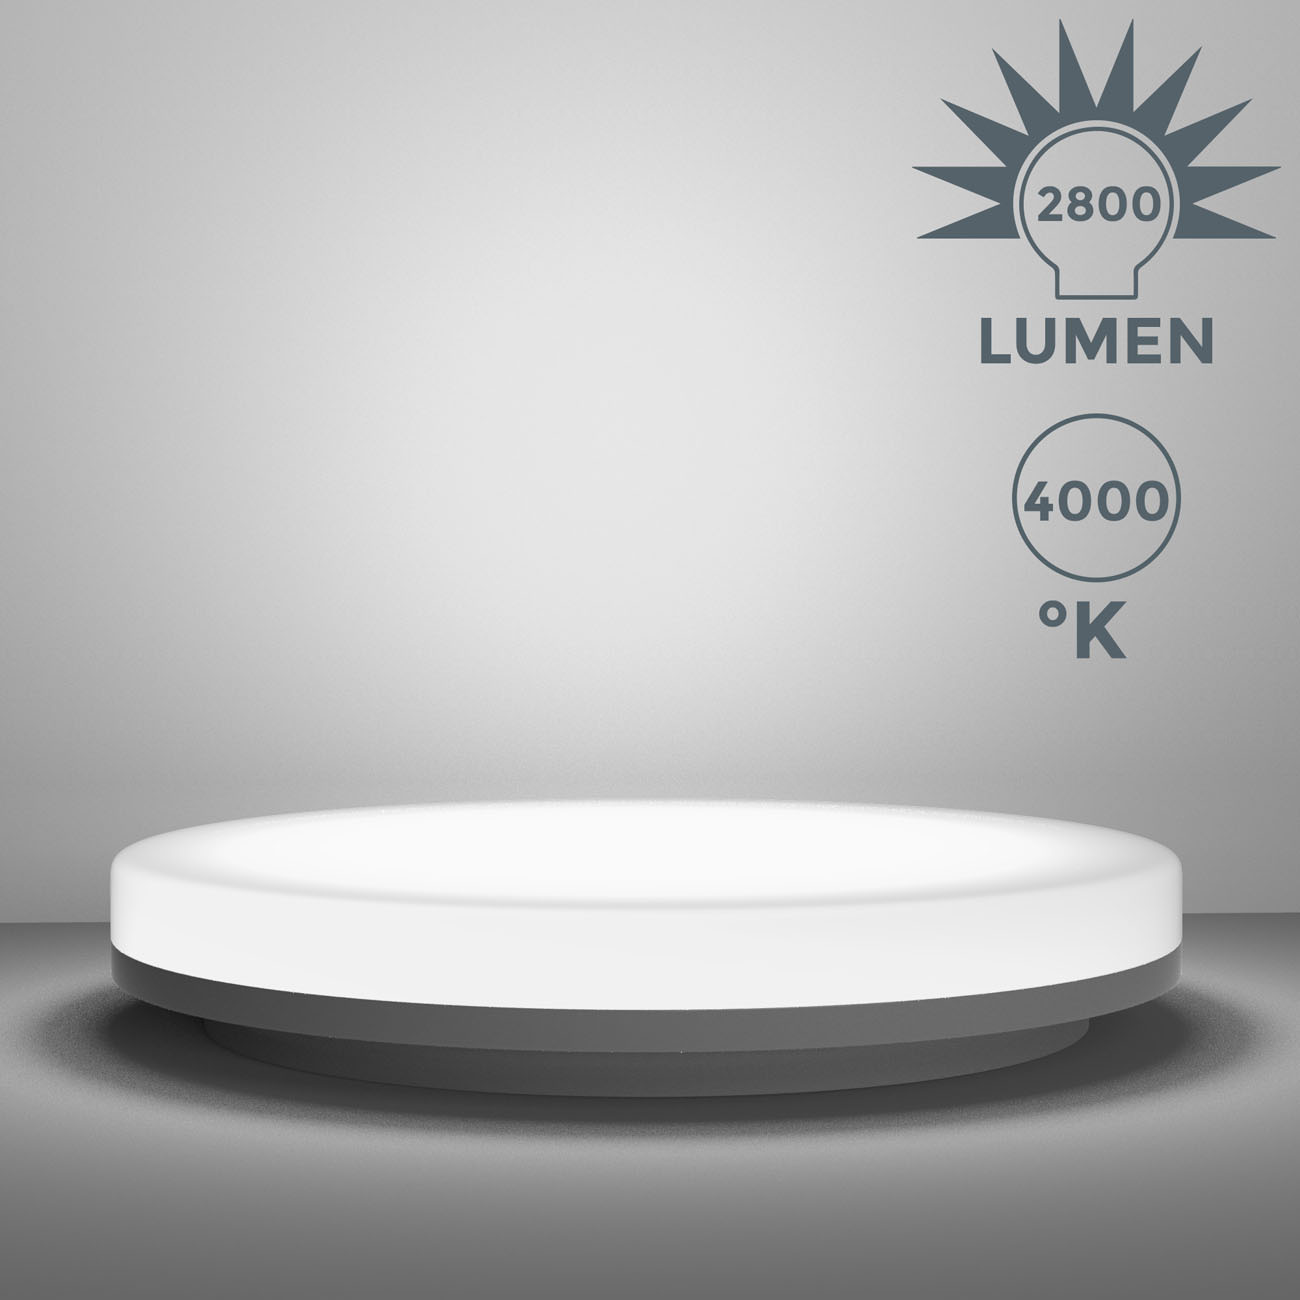 LED Deckenleuchte Badlampe IP54 L - 4